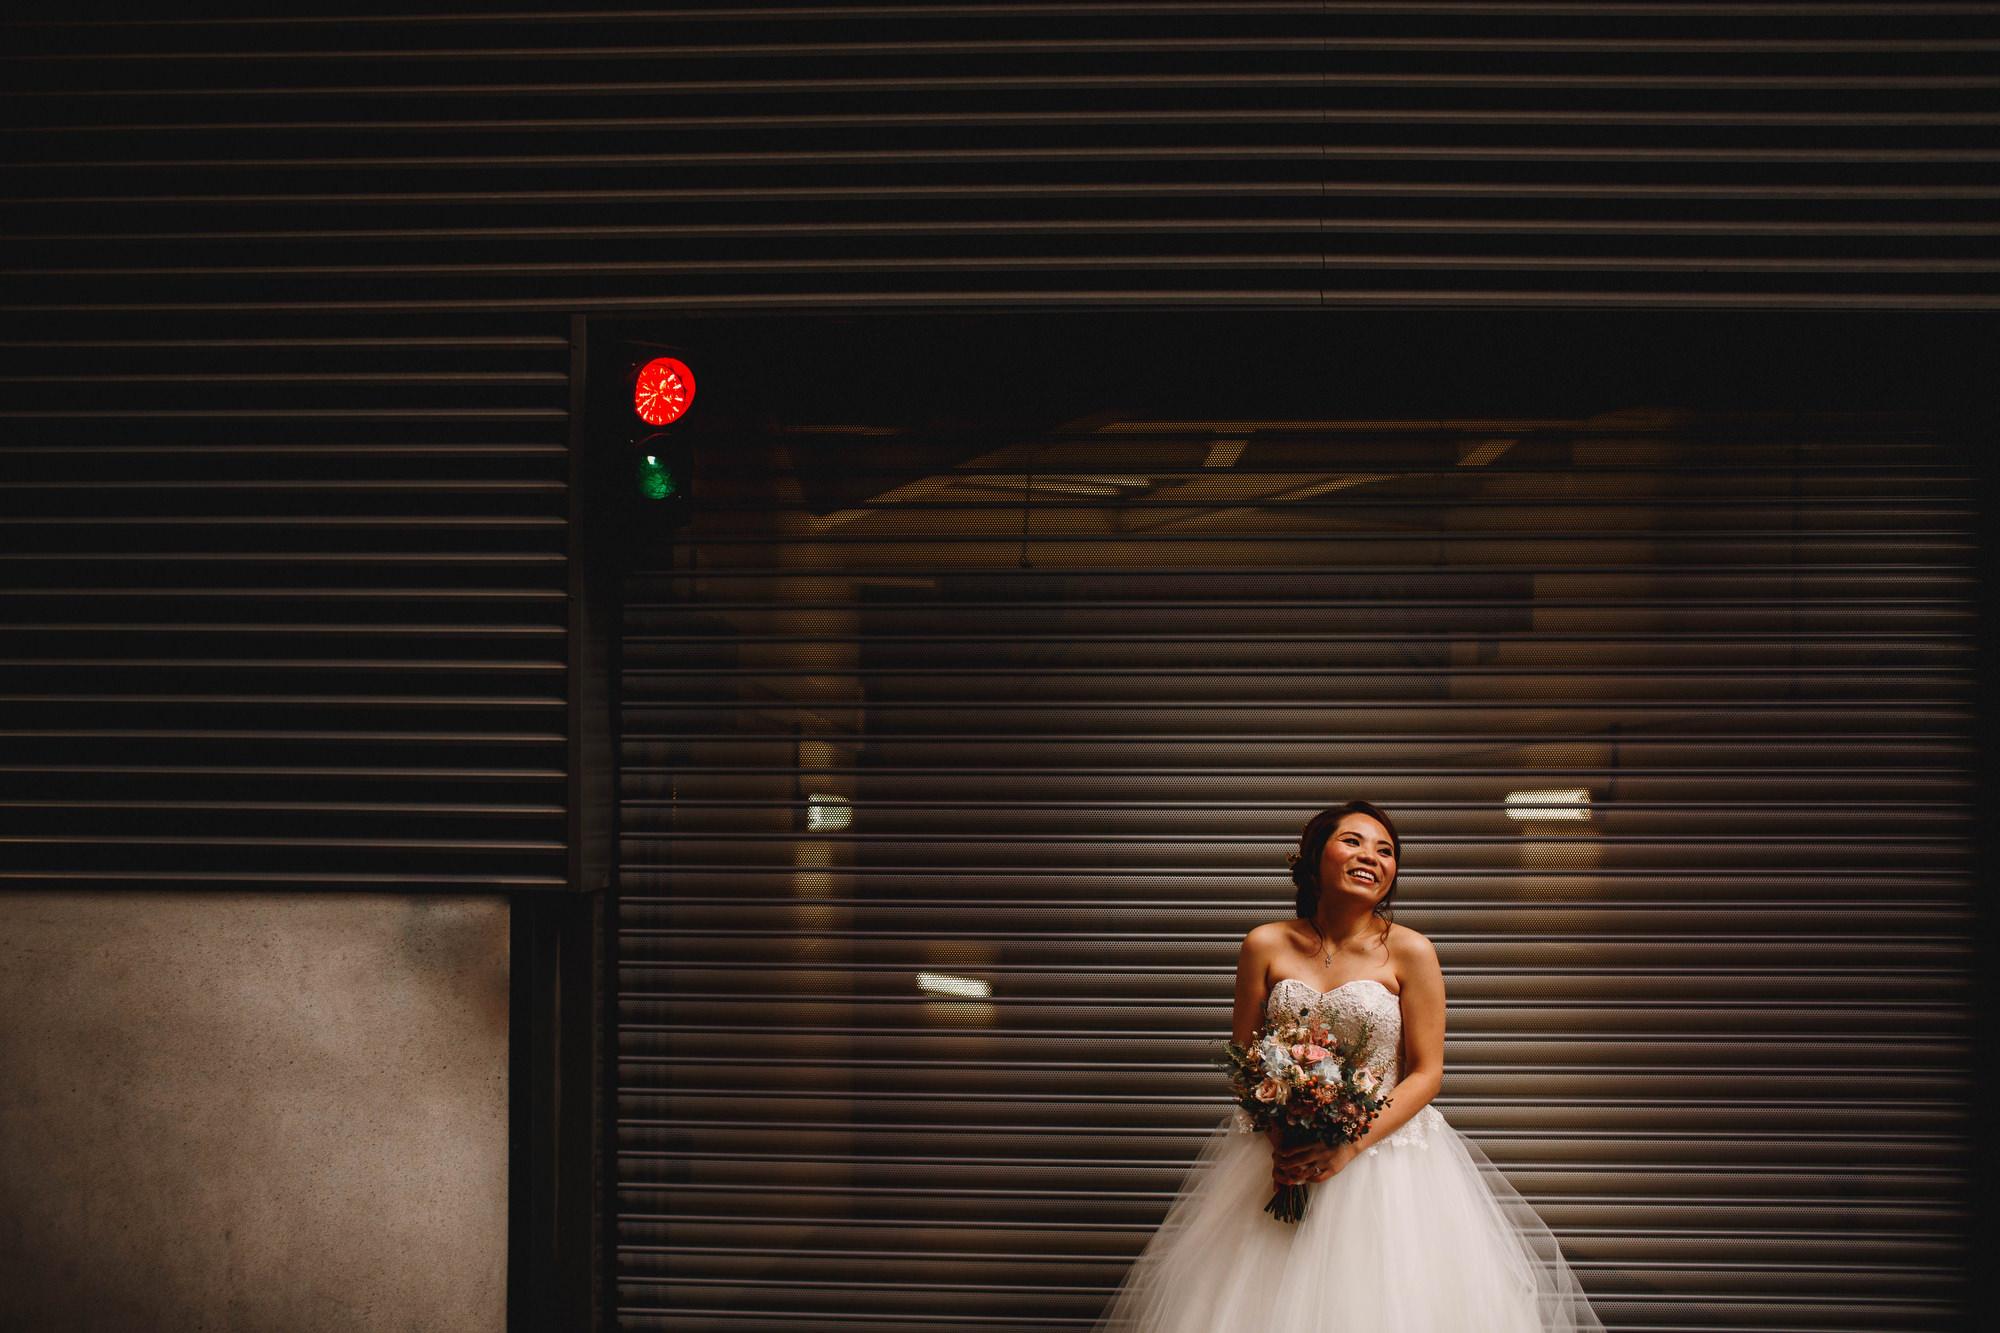 boob-asian-photographer-uk-wedding-fuckyvideo-rangiku